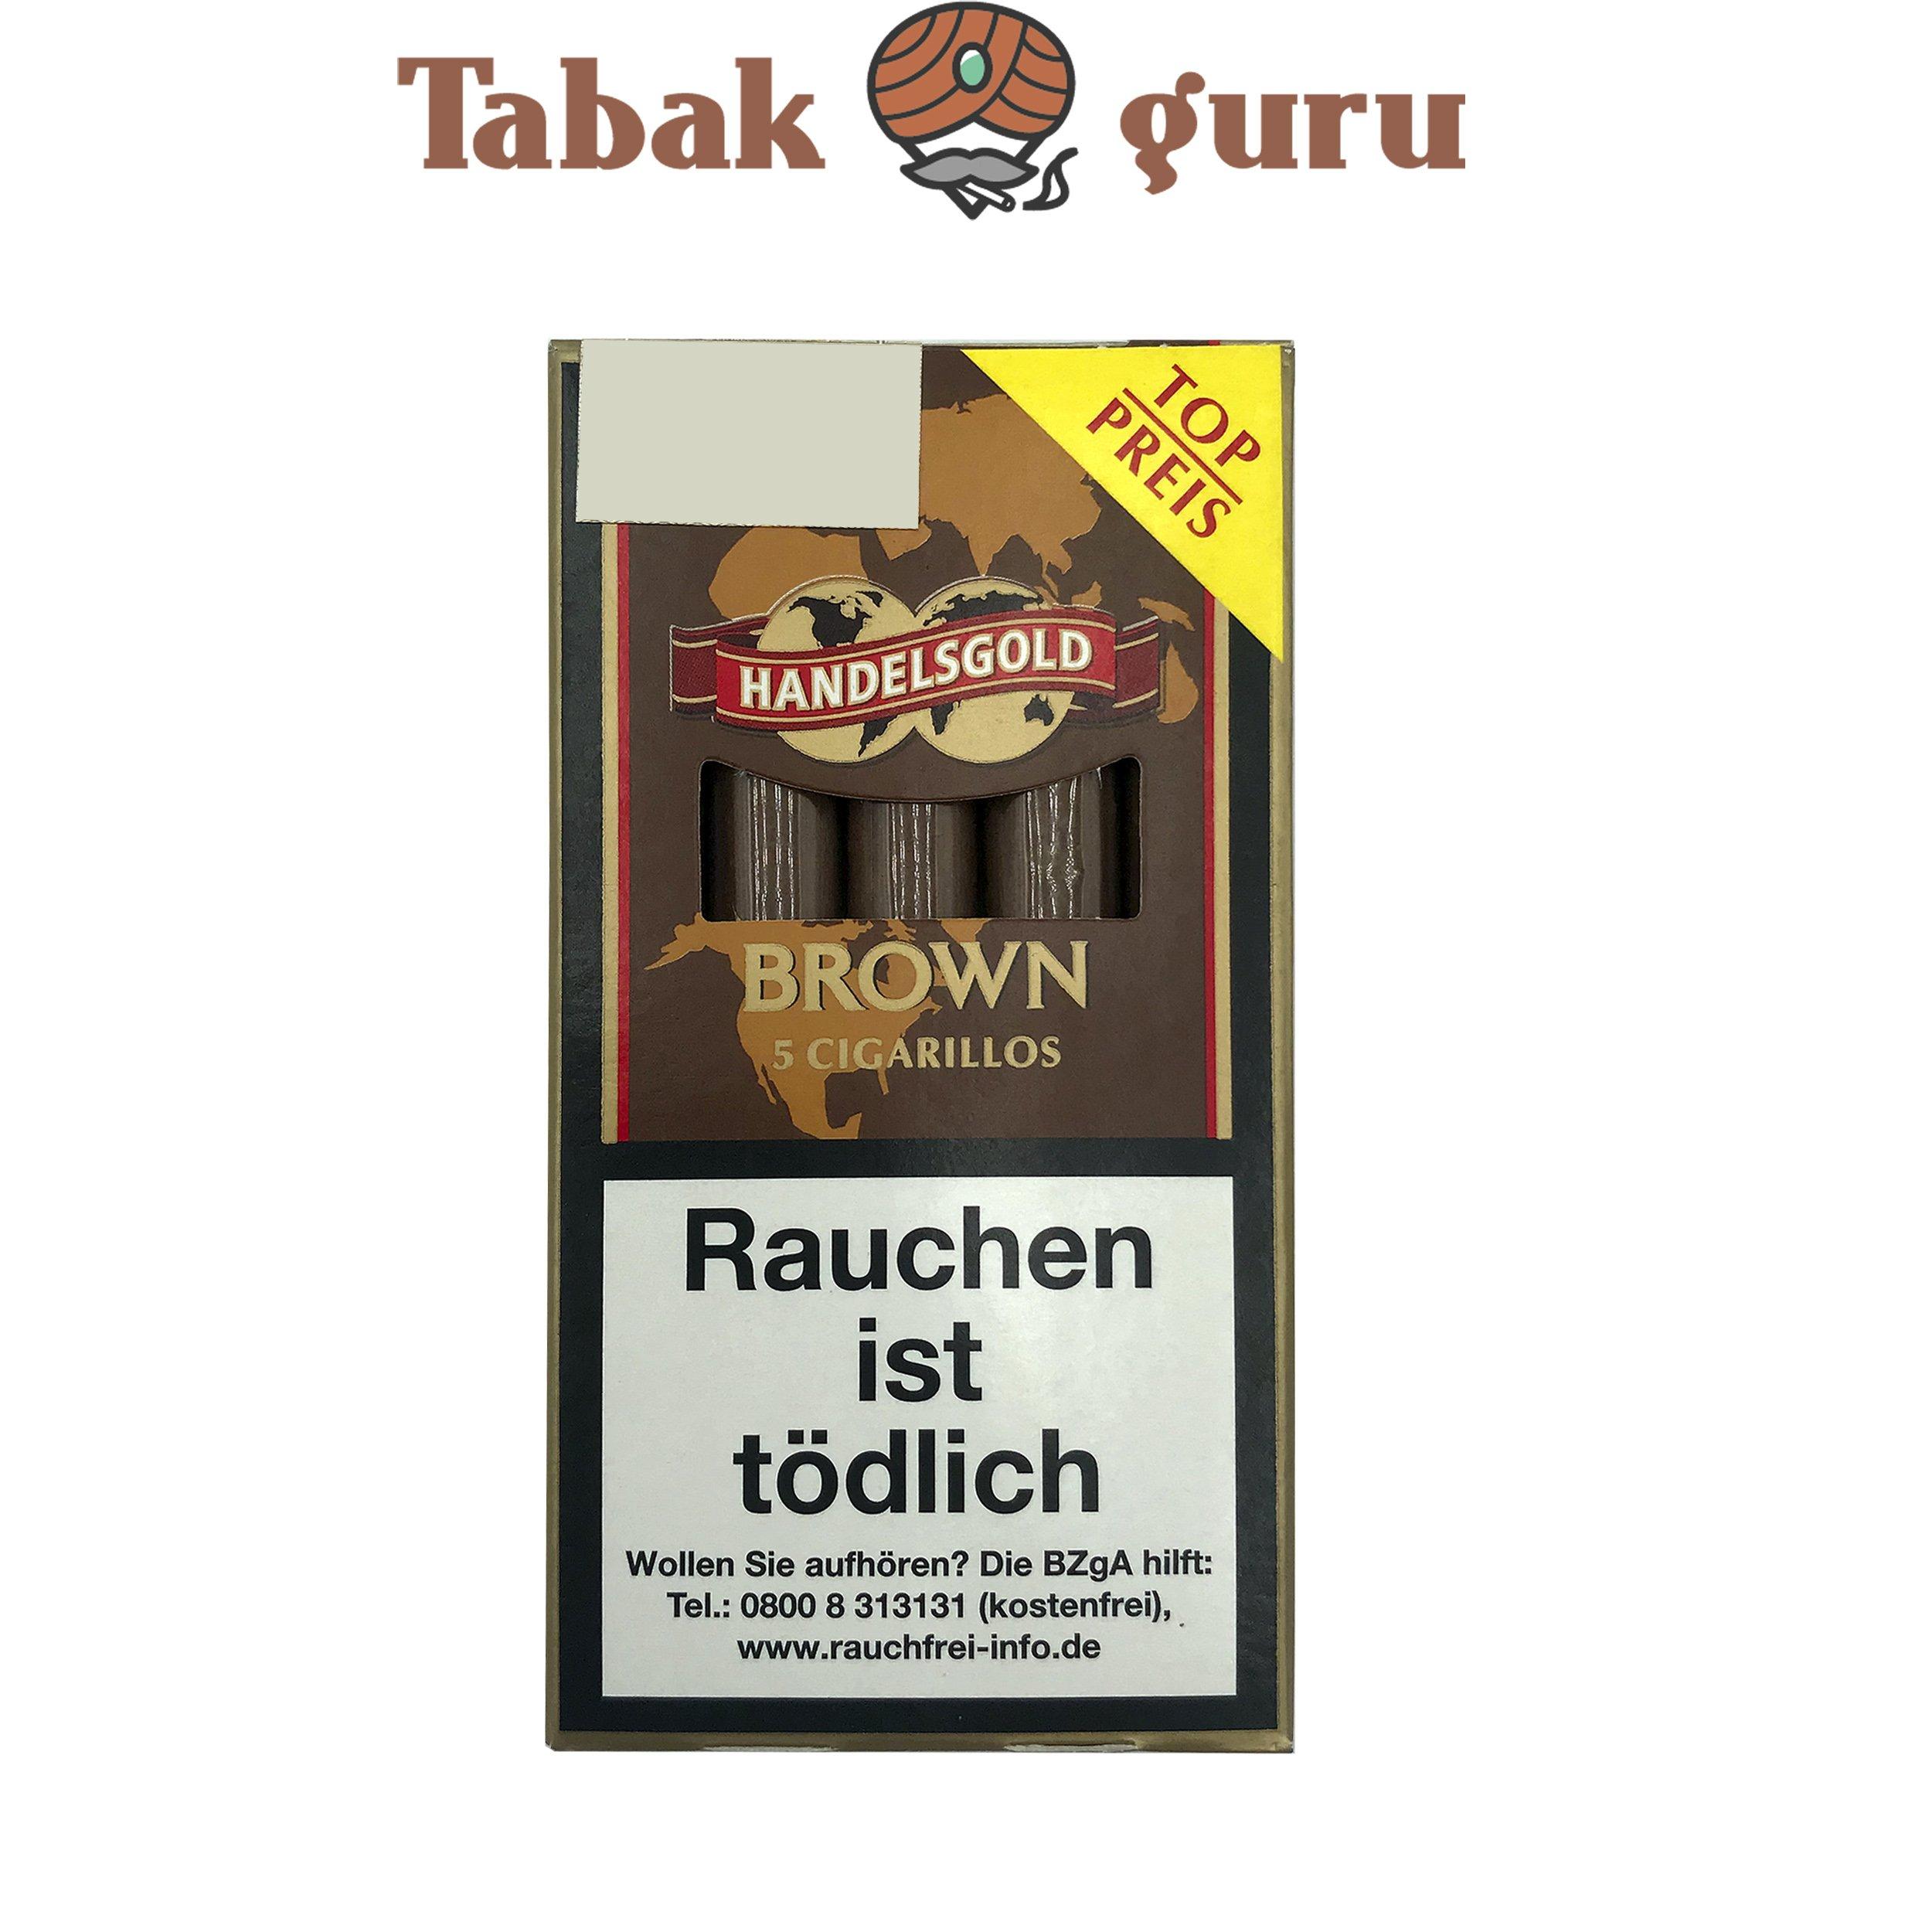 Handelsgold Brown No. 204 Filterzigarillos a 5 Stück